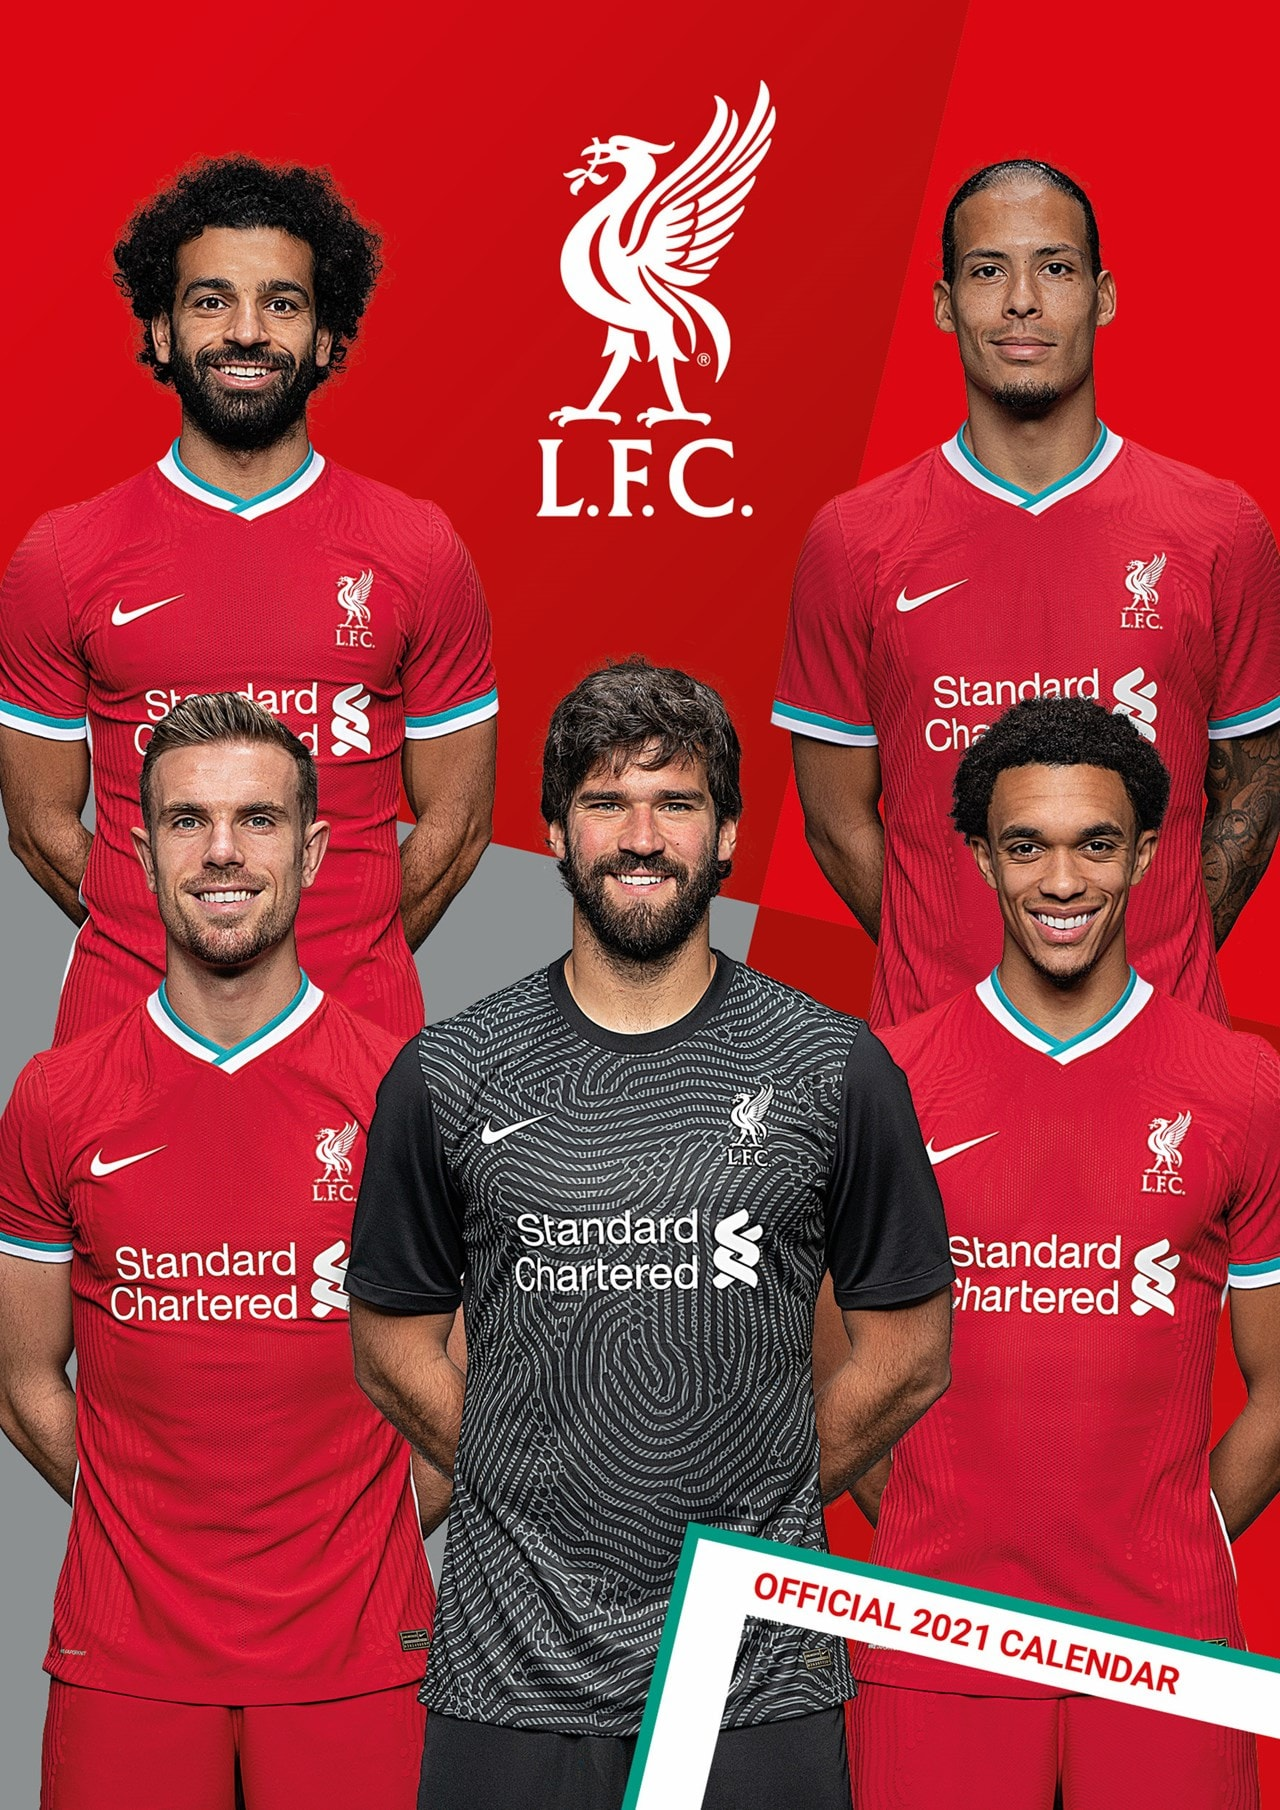 Liverpool FC: Football A3 2021 Calendar - 1